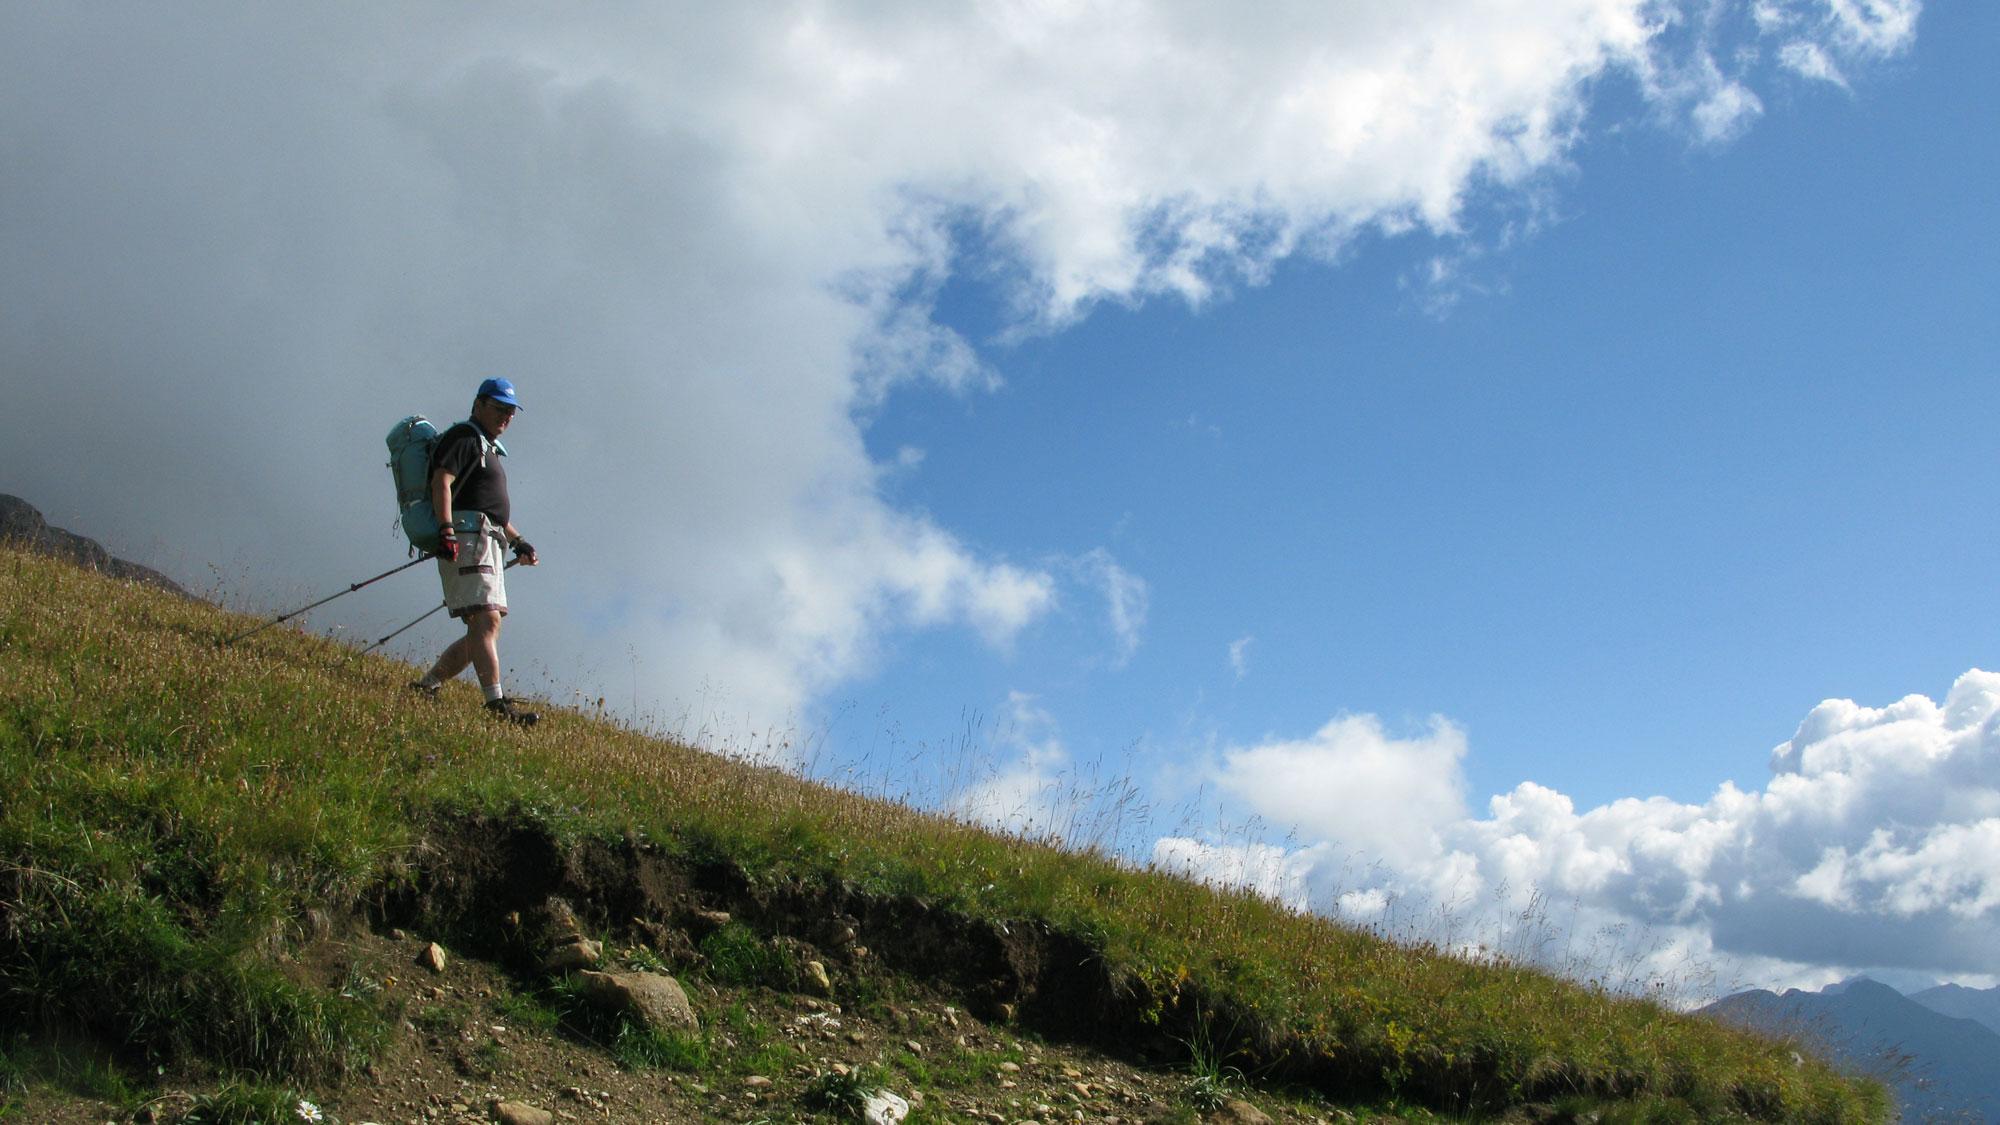 wp-content/uploads/itineraries/Dolomites/dolomites-hiking-8.jpg